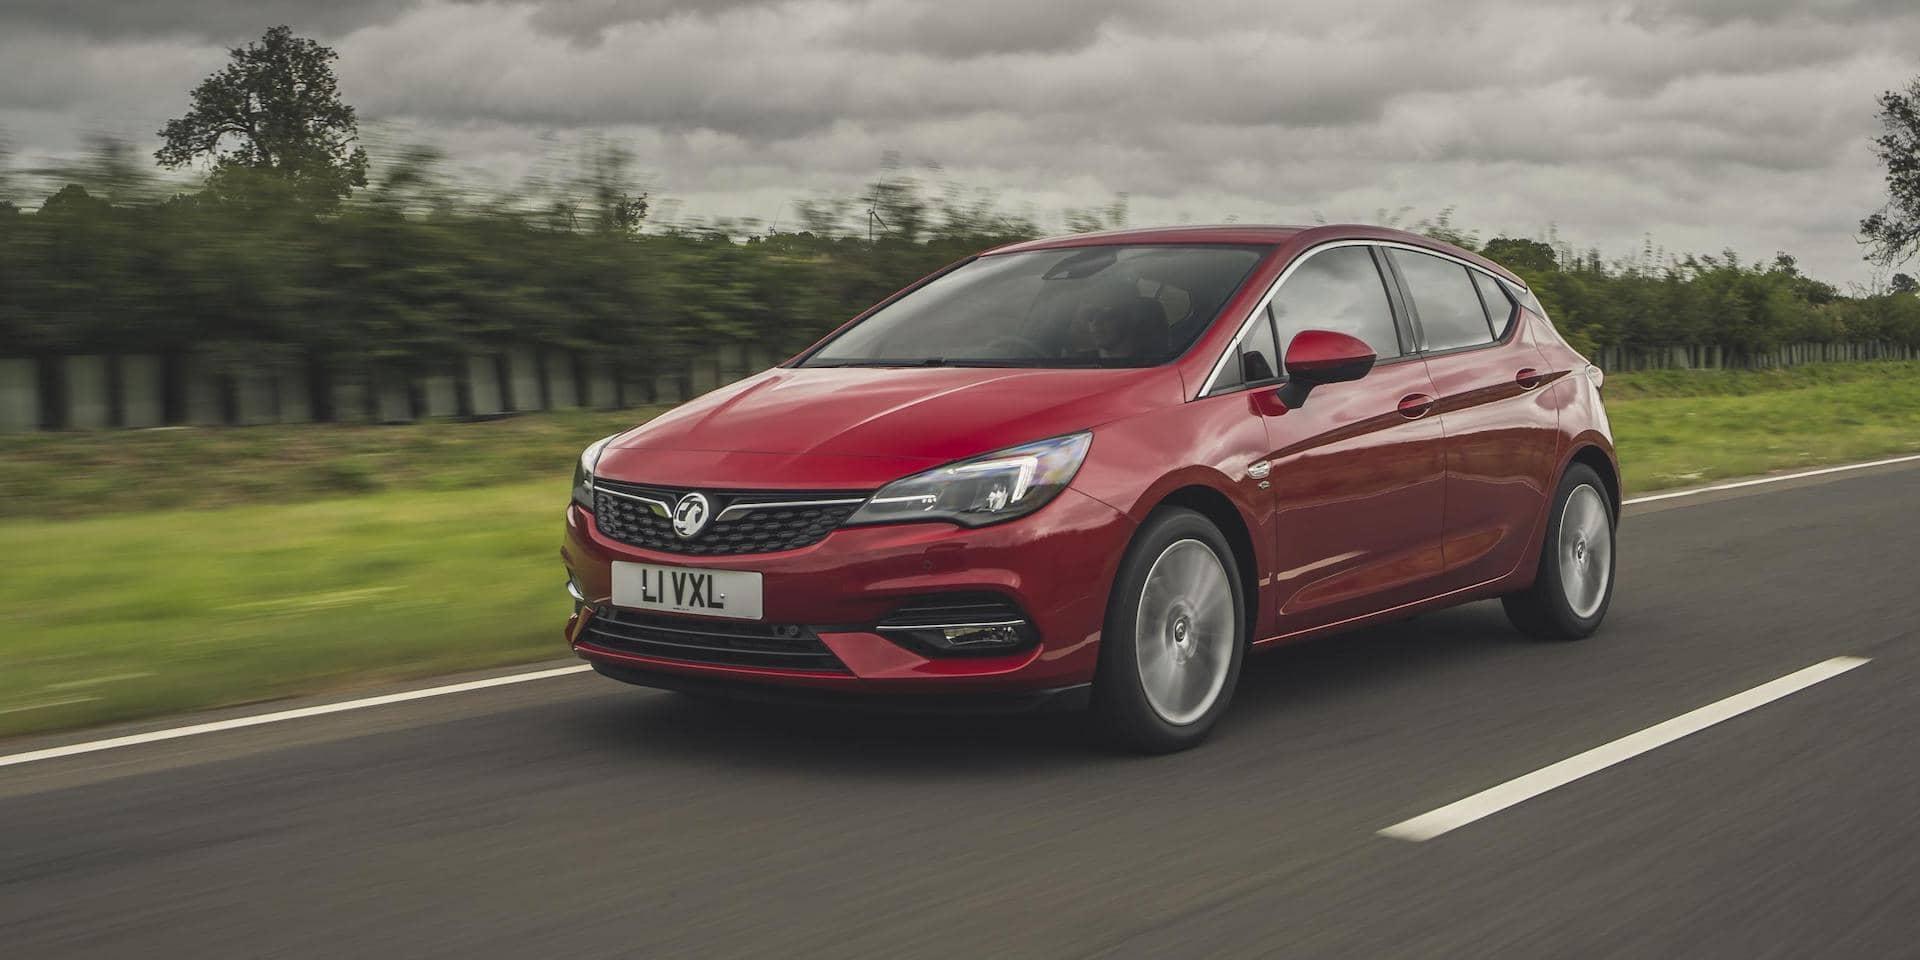 Vauxhall Astra (2015 - present) Expert Rating | The Car Expert